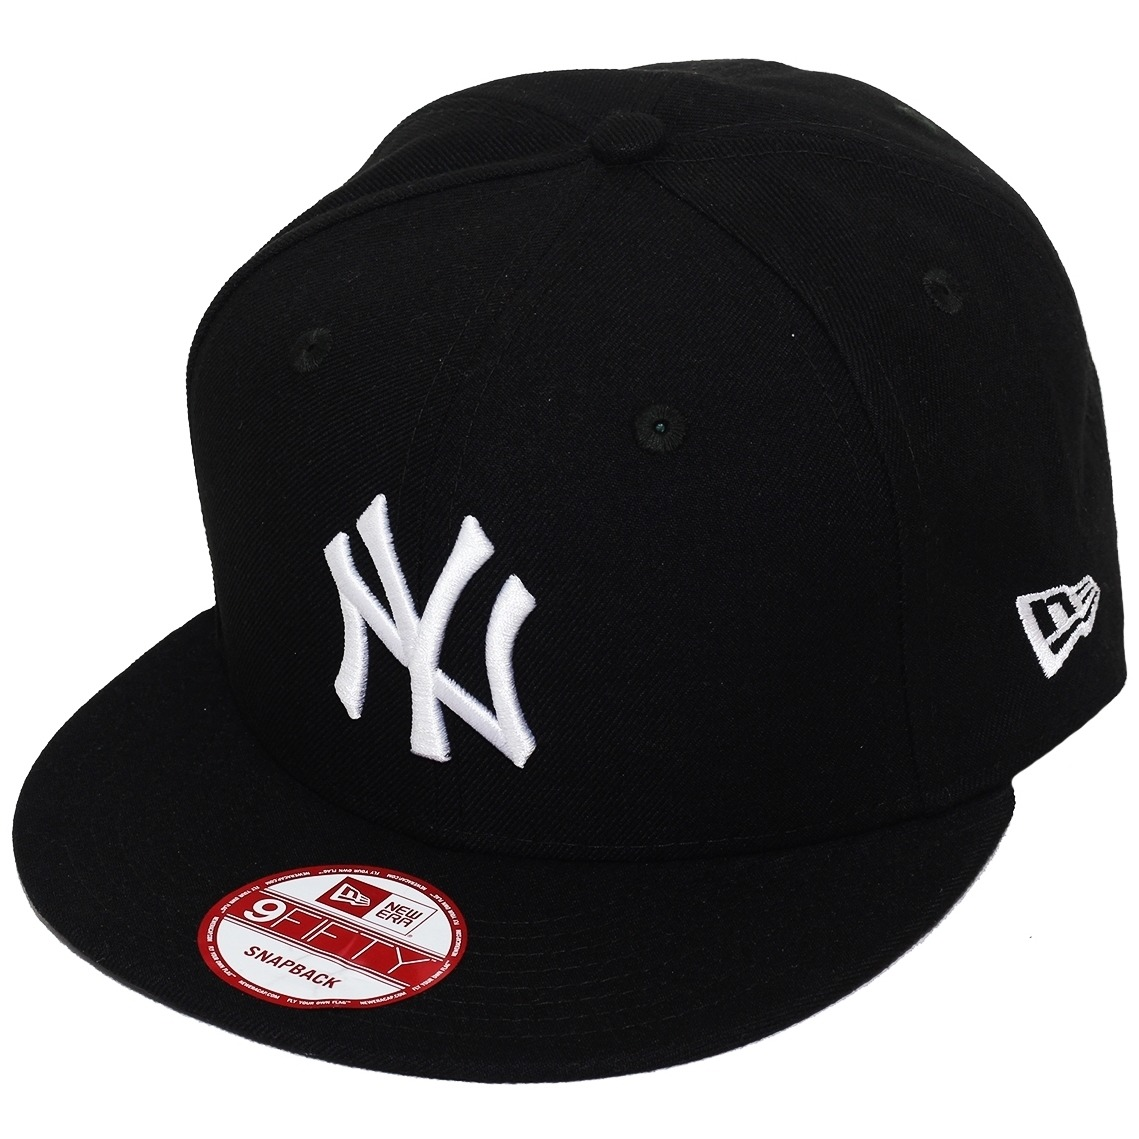 Boné New Era Aba Reta Snapback Mlb Ny Yankees Colors Preto - R  169 ... 420e8b528df